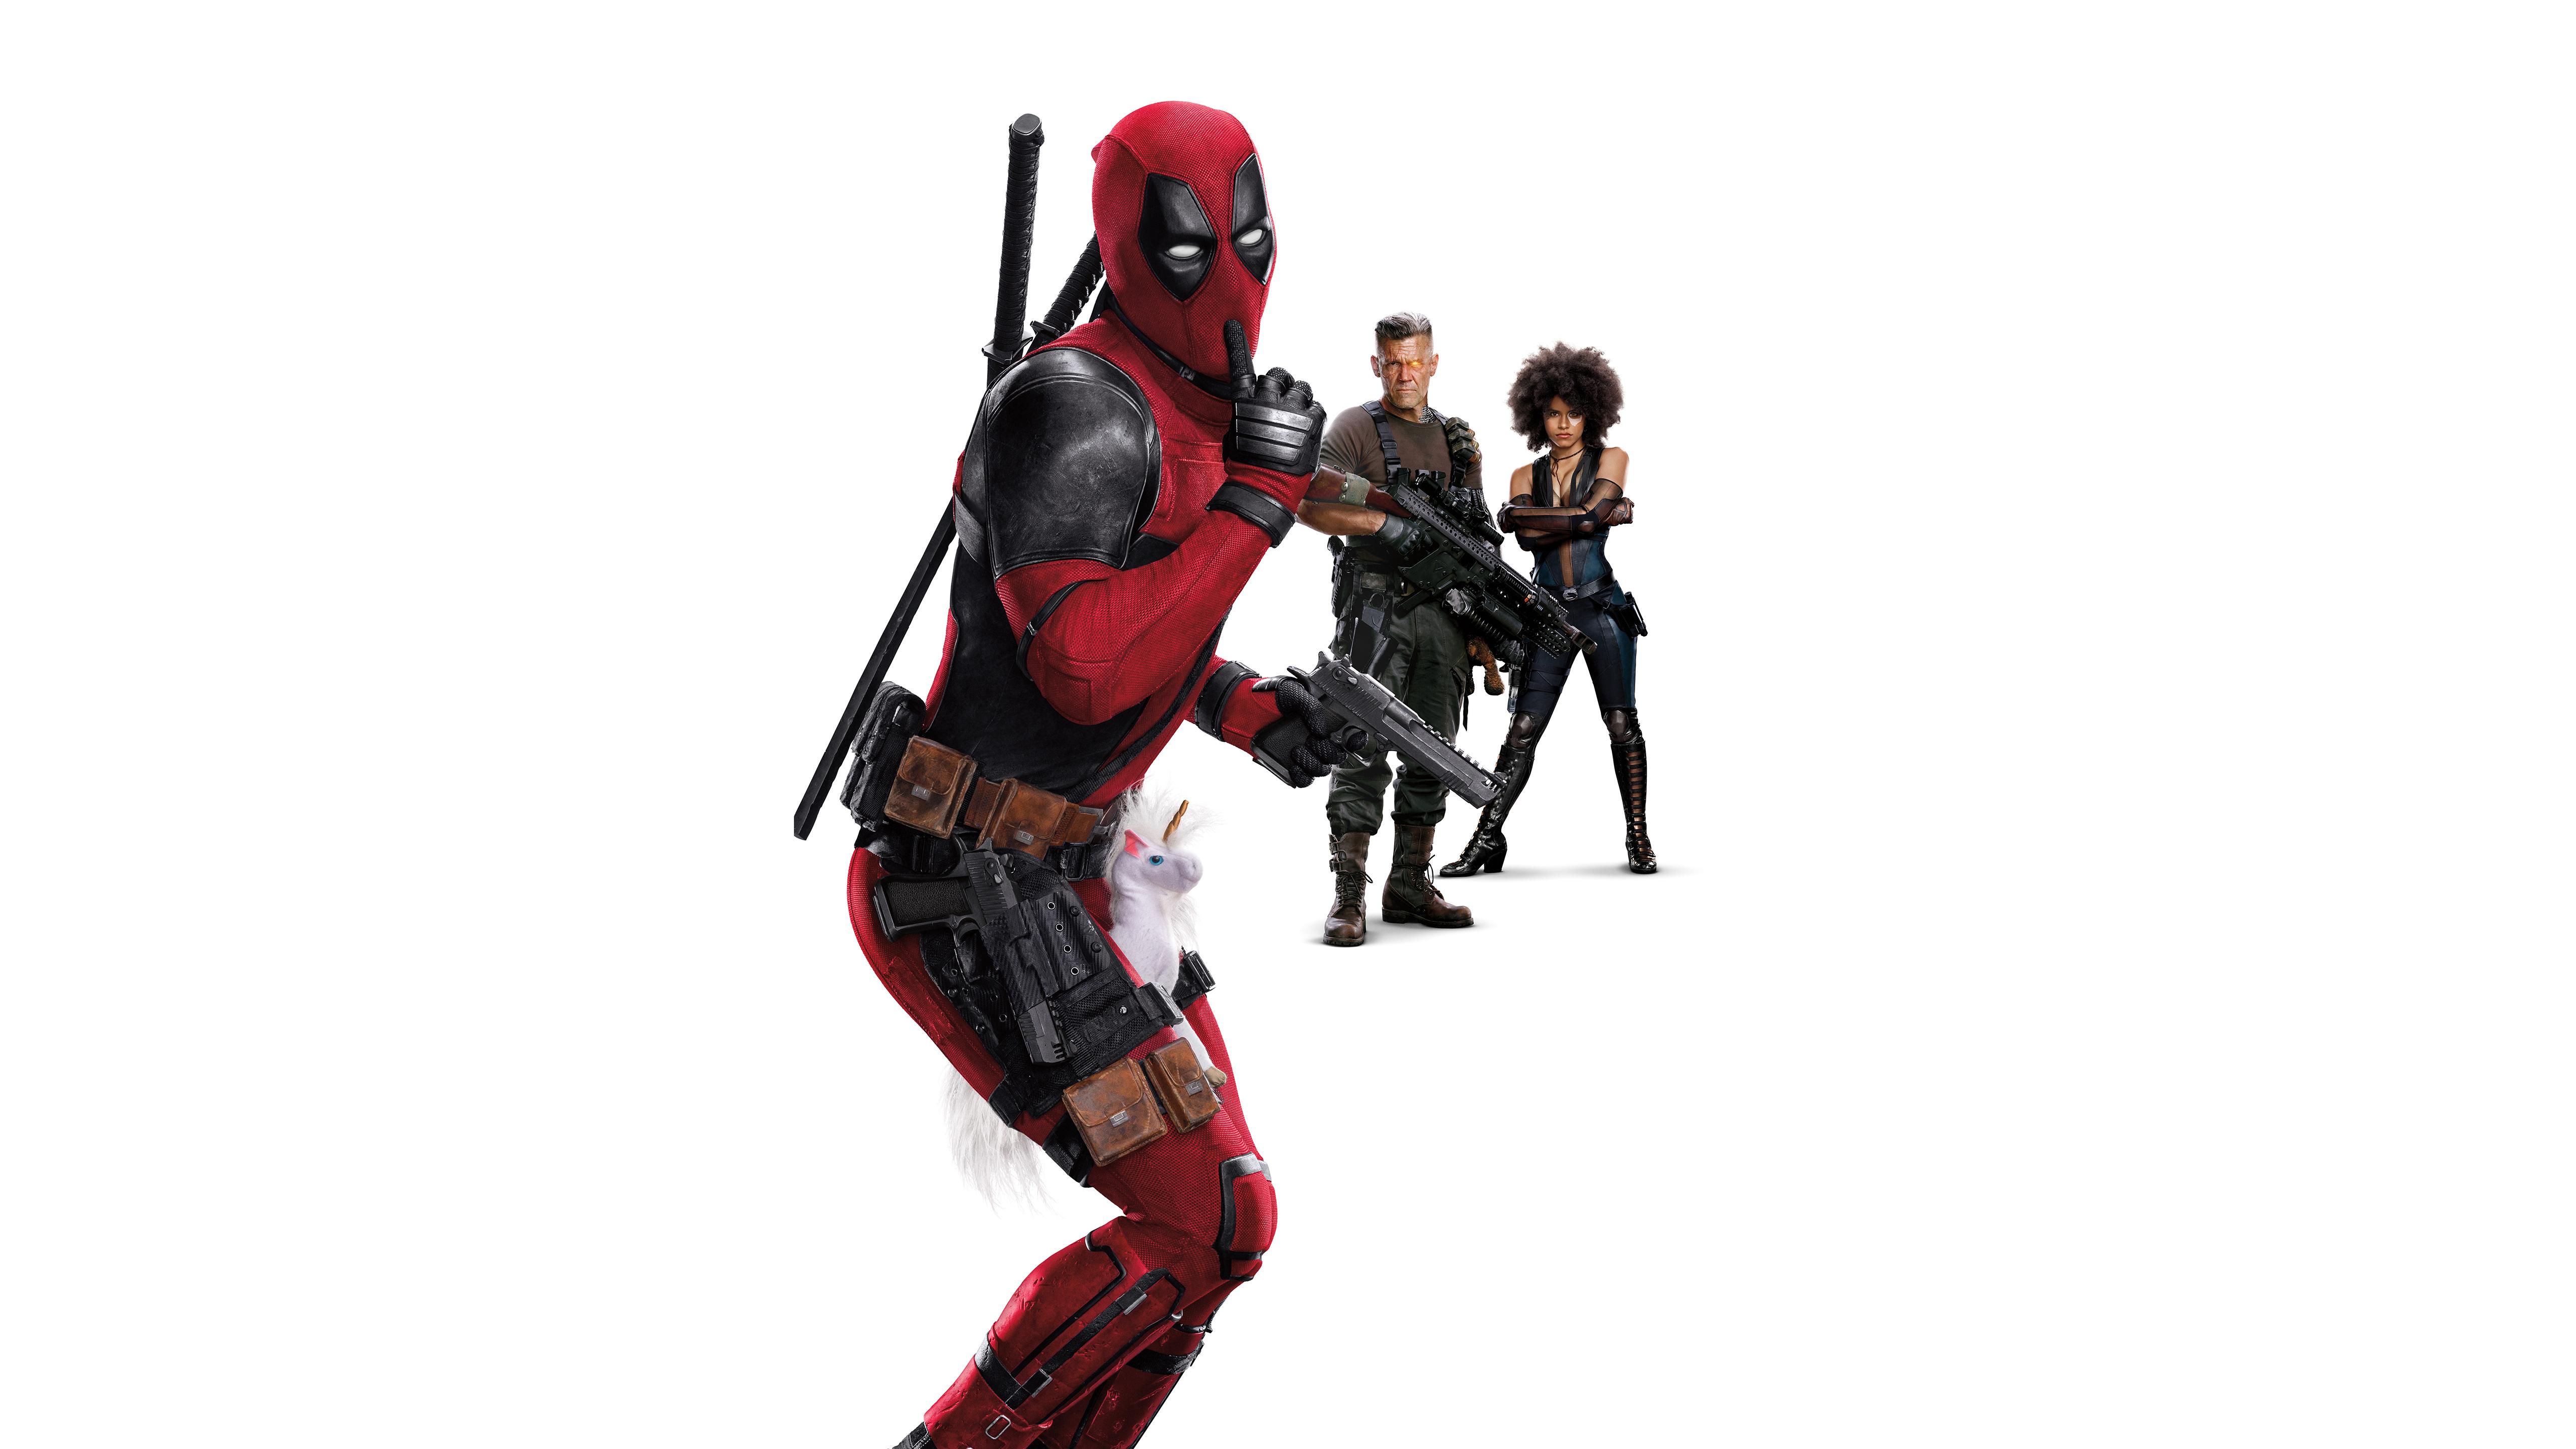 Deadpool 2 Movie 5k, HD Movies, 4k Wallpapers, Images